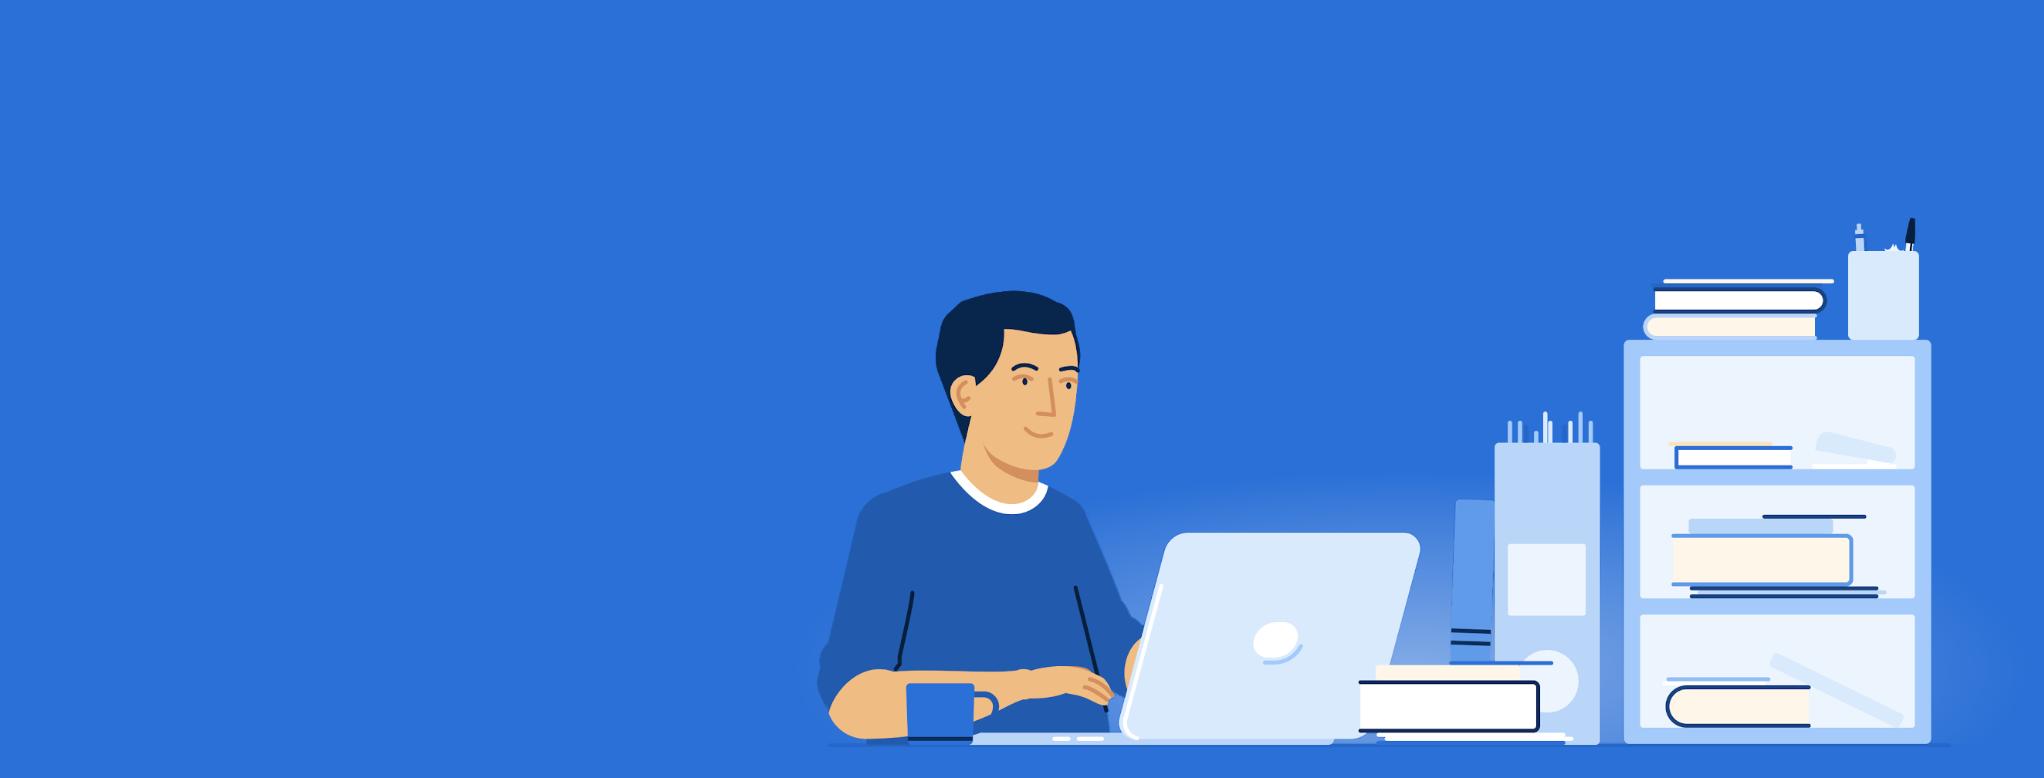 Payfit: Reviews & Pricing - Make Managing Payroll a Breeze